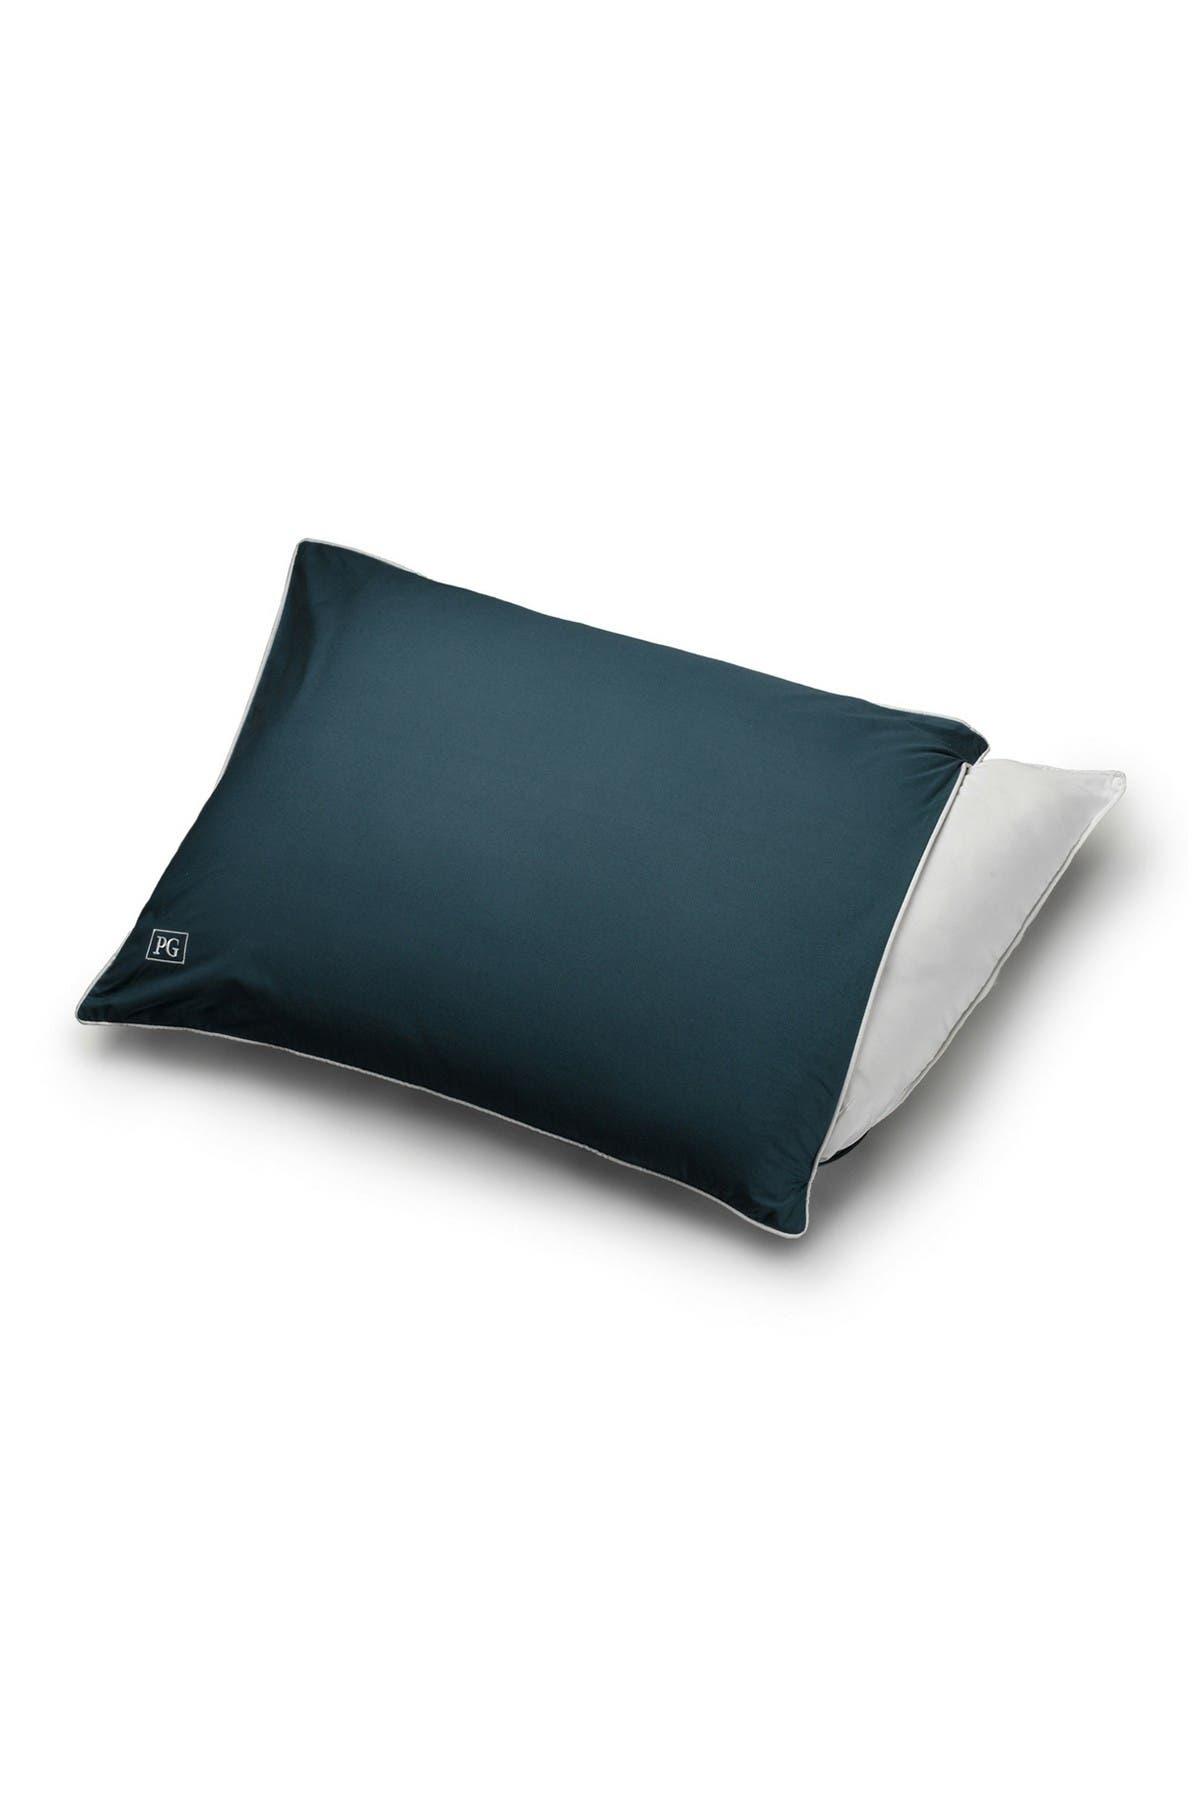 Image of Pillow Guy Down Alternative MicronOne Technology Side & Back Sleeper Overstuffed Pillow